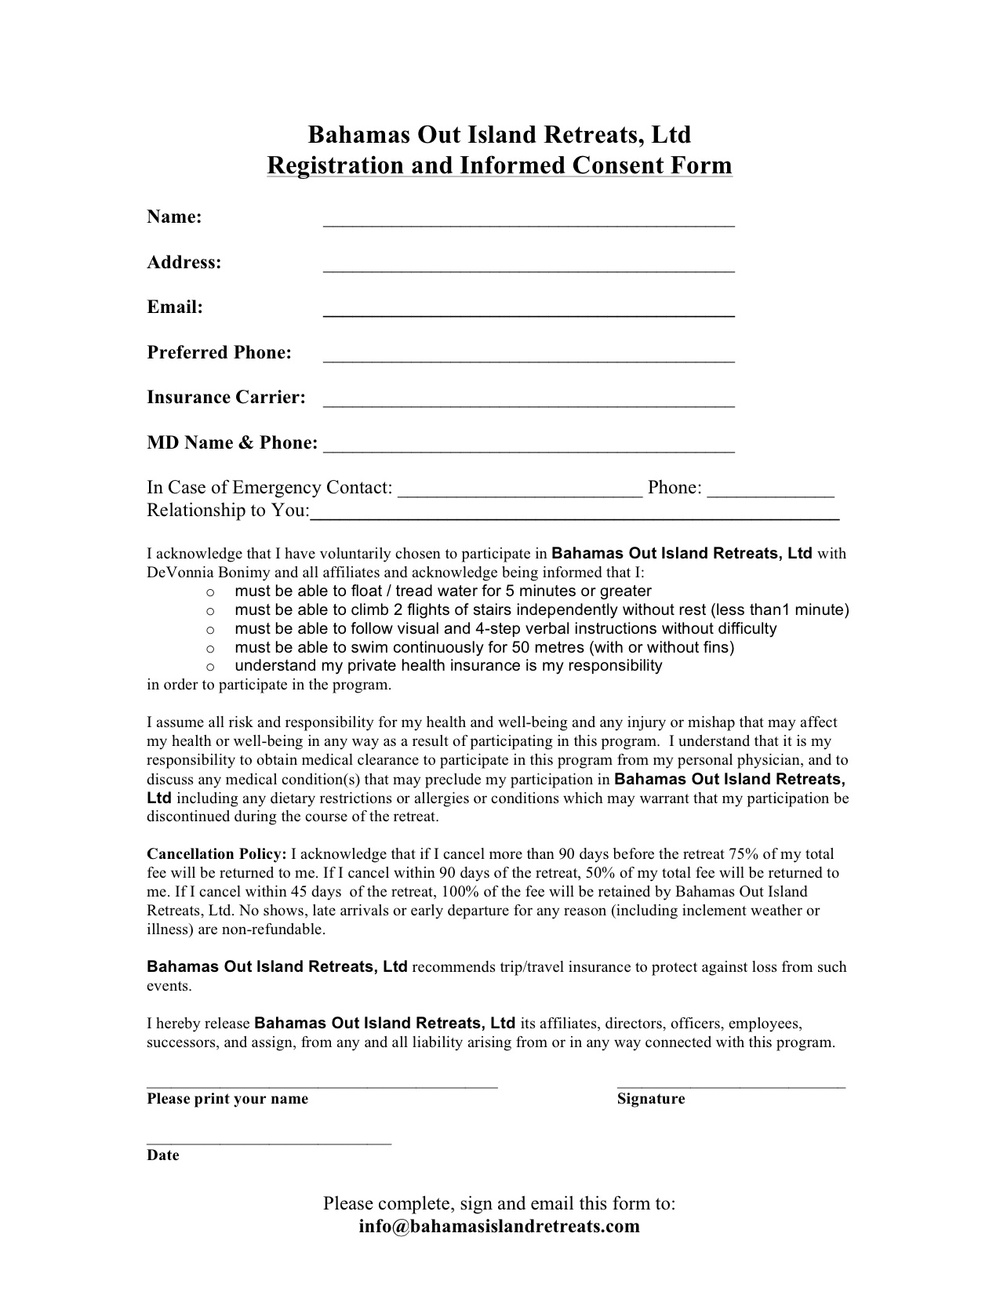 Consent Form — Bahamas Out Island Retreats